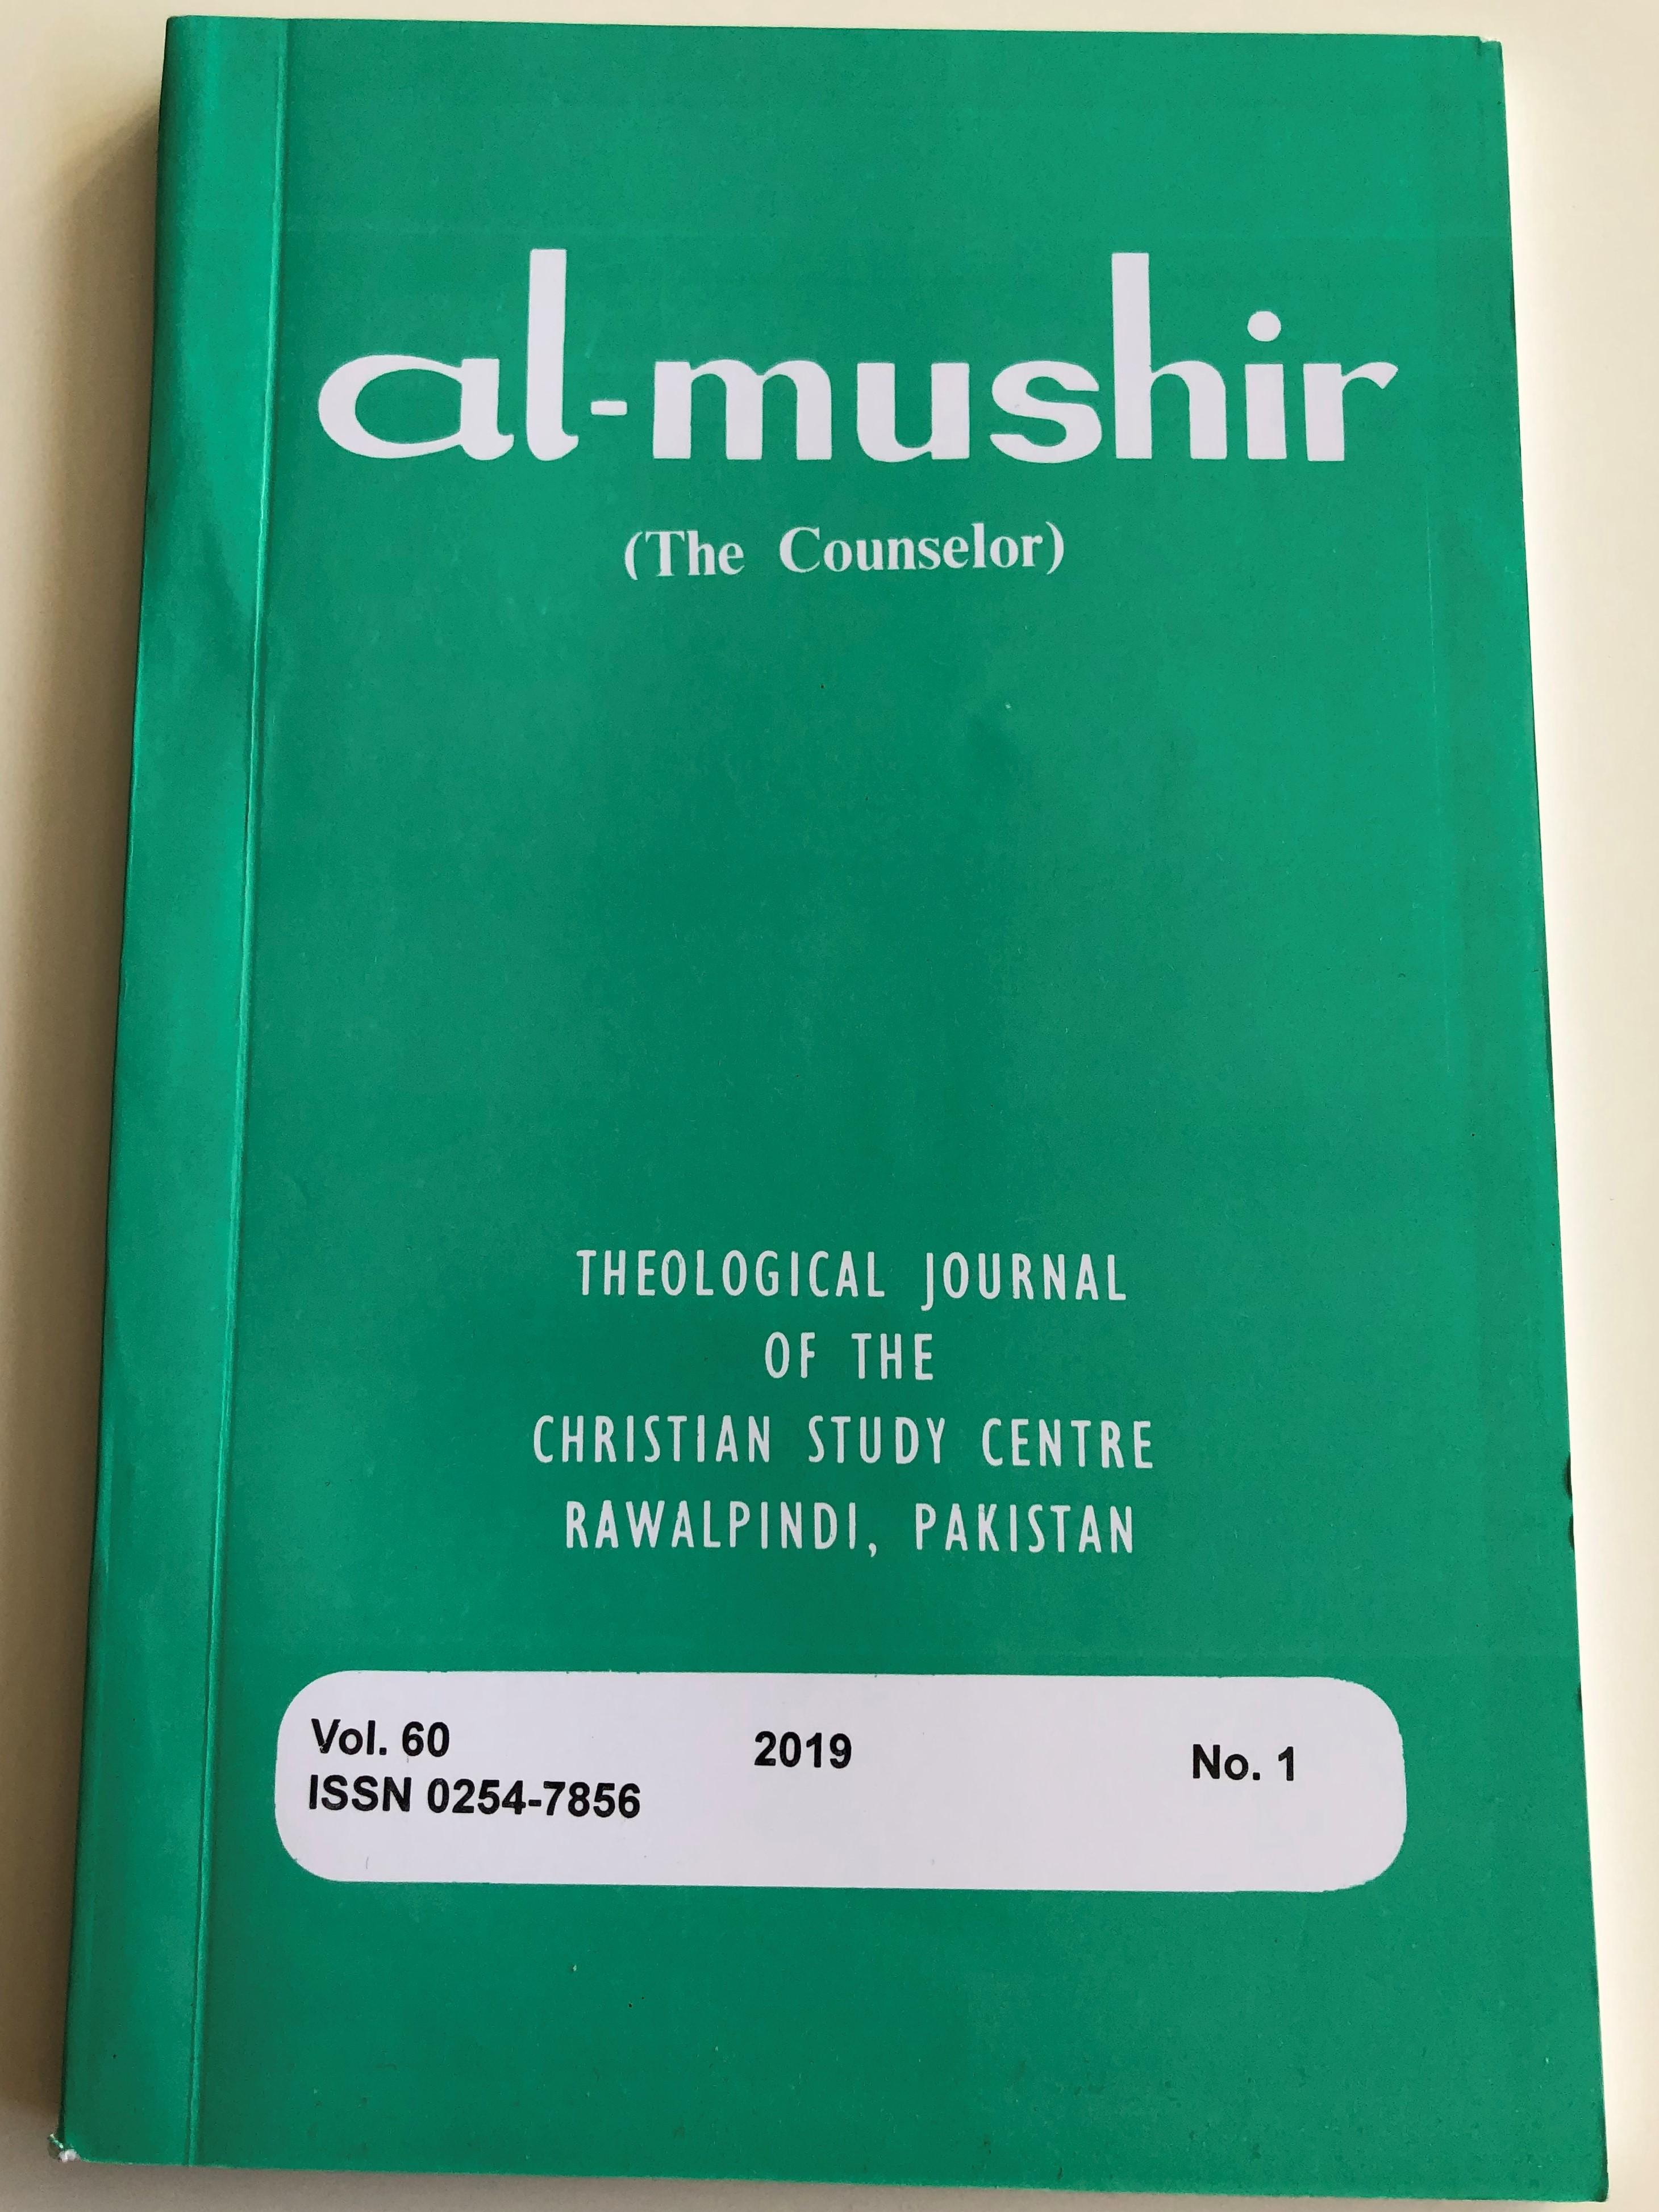 al-mushir-the-counselor-volume-60.-no.-1-1.jpg